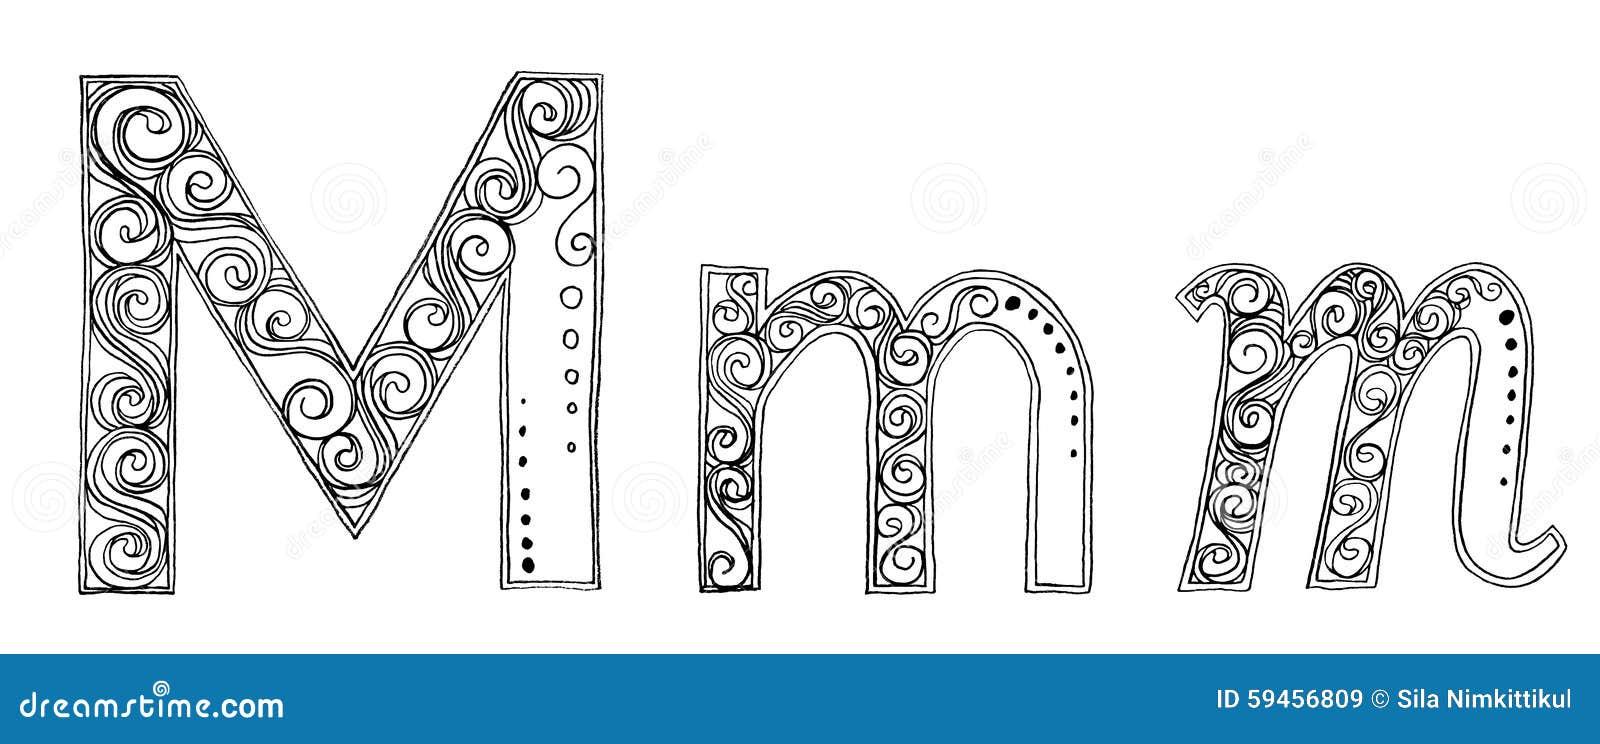 M Vanda Freehand Pencil Sketch Font Stock Illustration